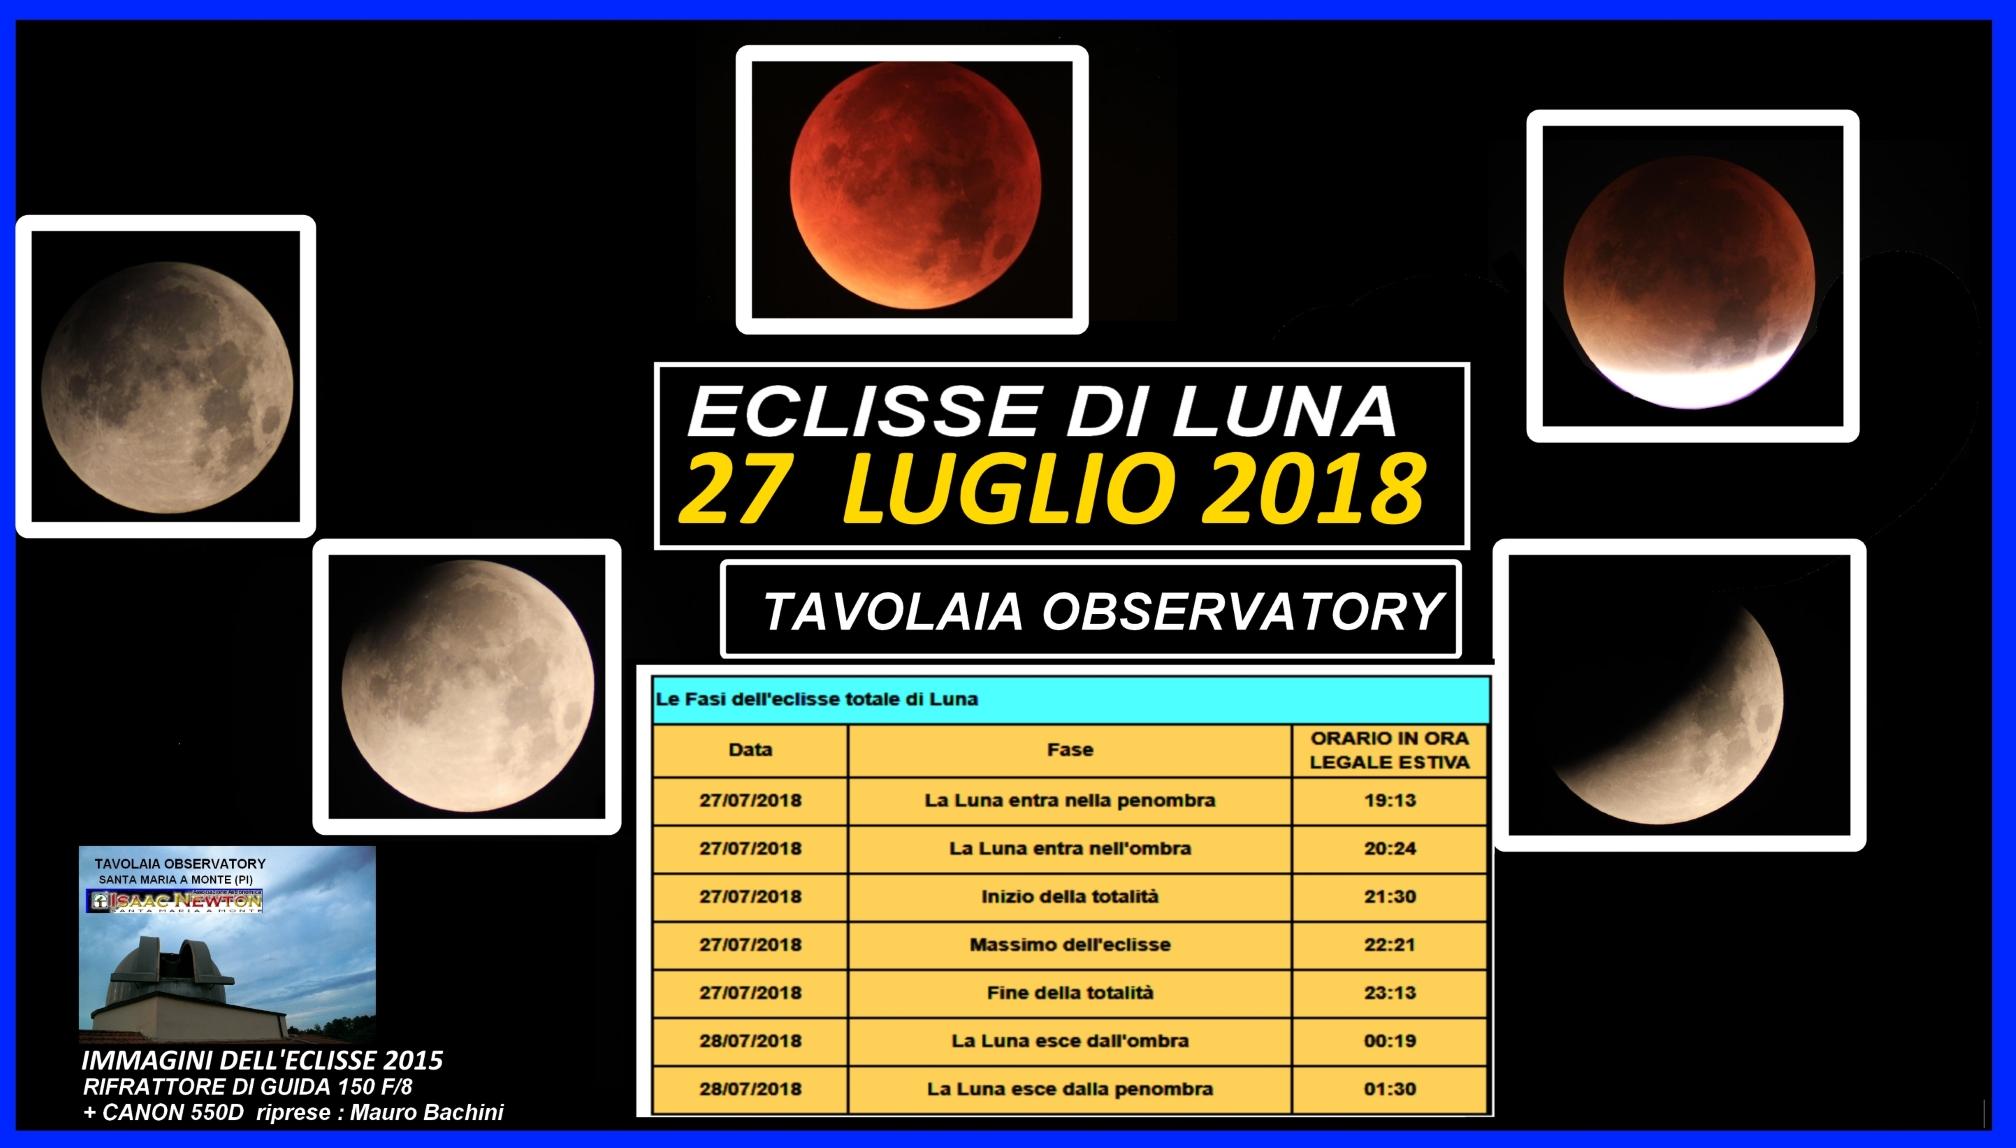 eclisse-lunabbbbbb.jpg